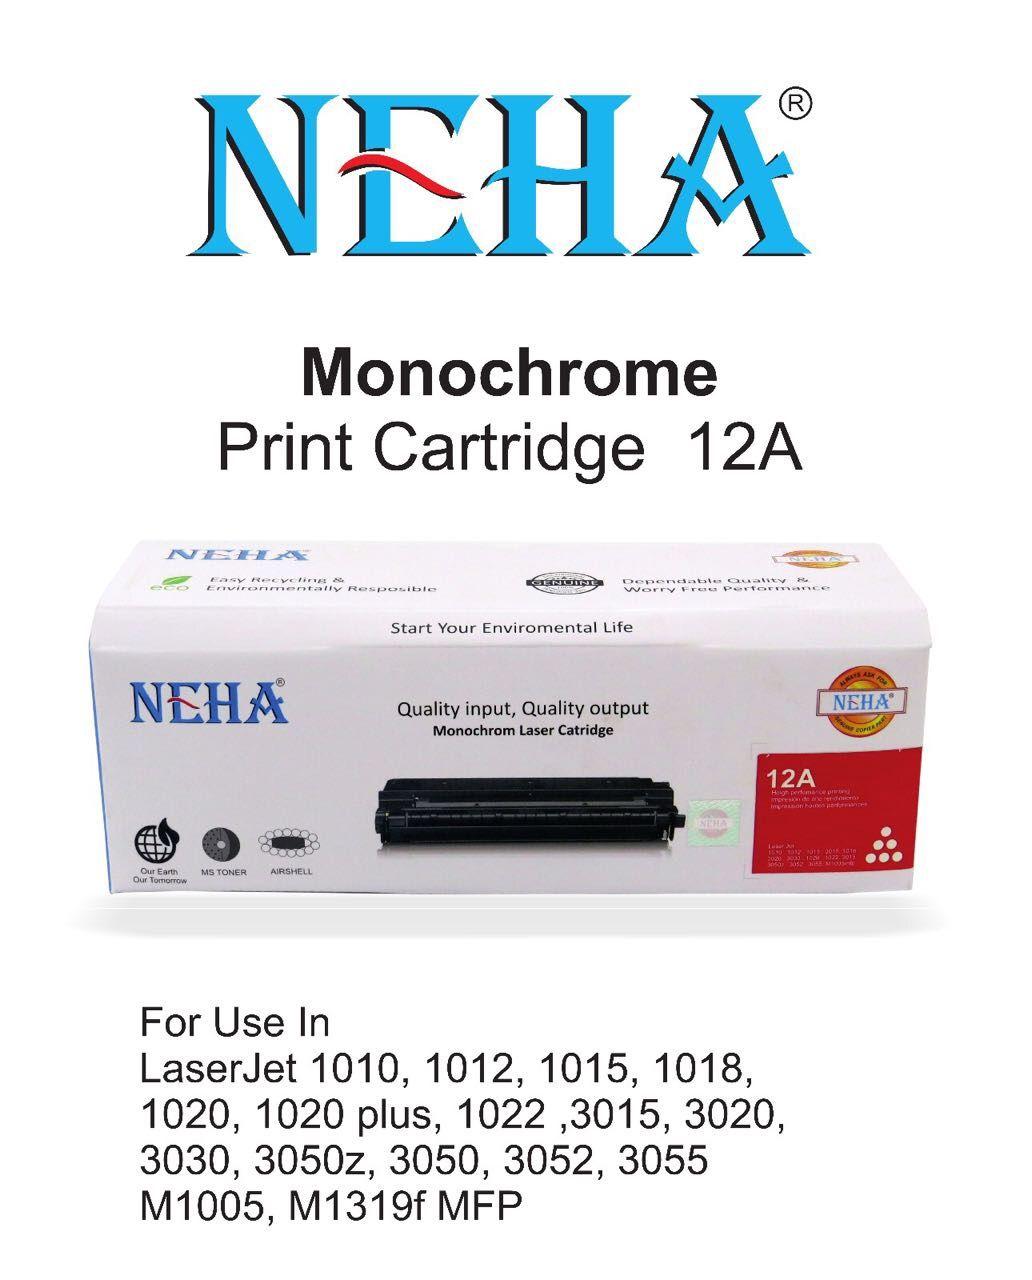 Neha Toner Cartridge 12a Laser Jet 101010121015101810203020 Compatible 1020 10101012101510181020